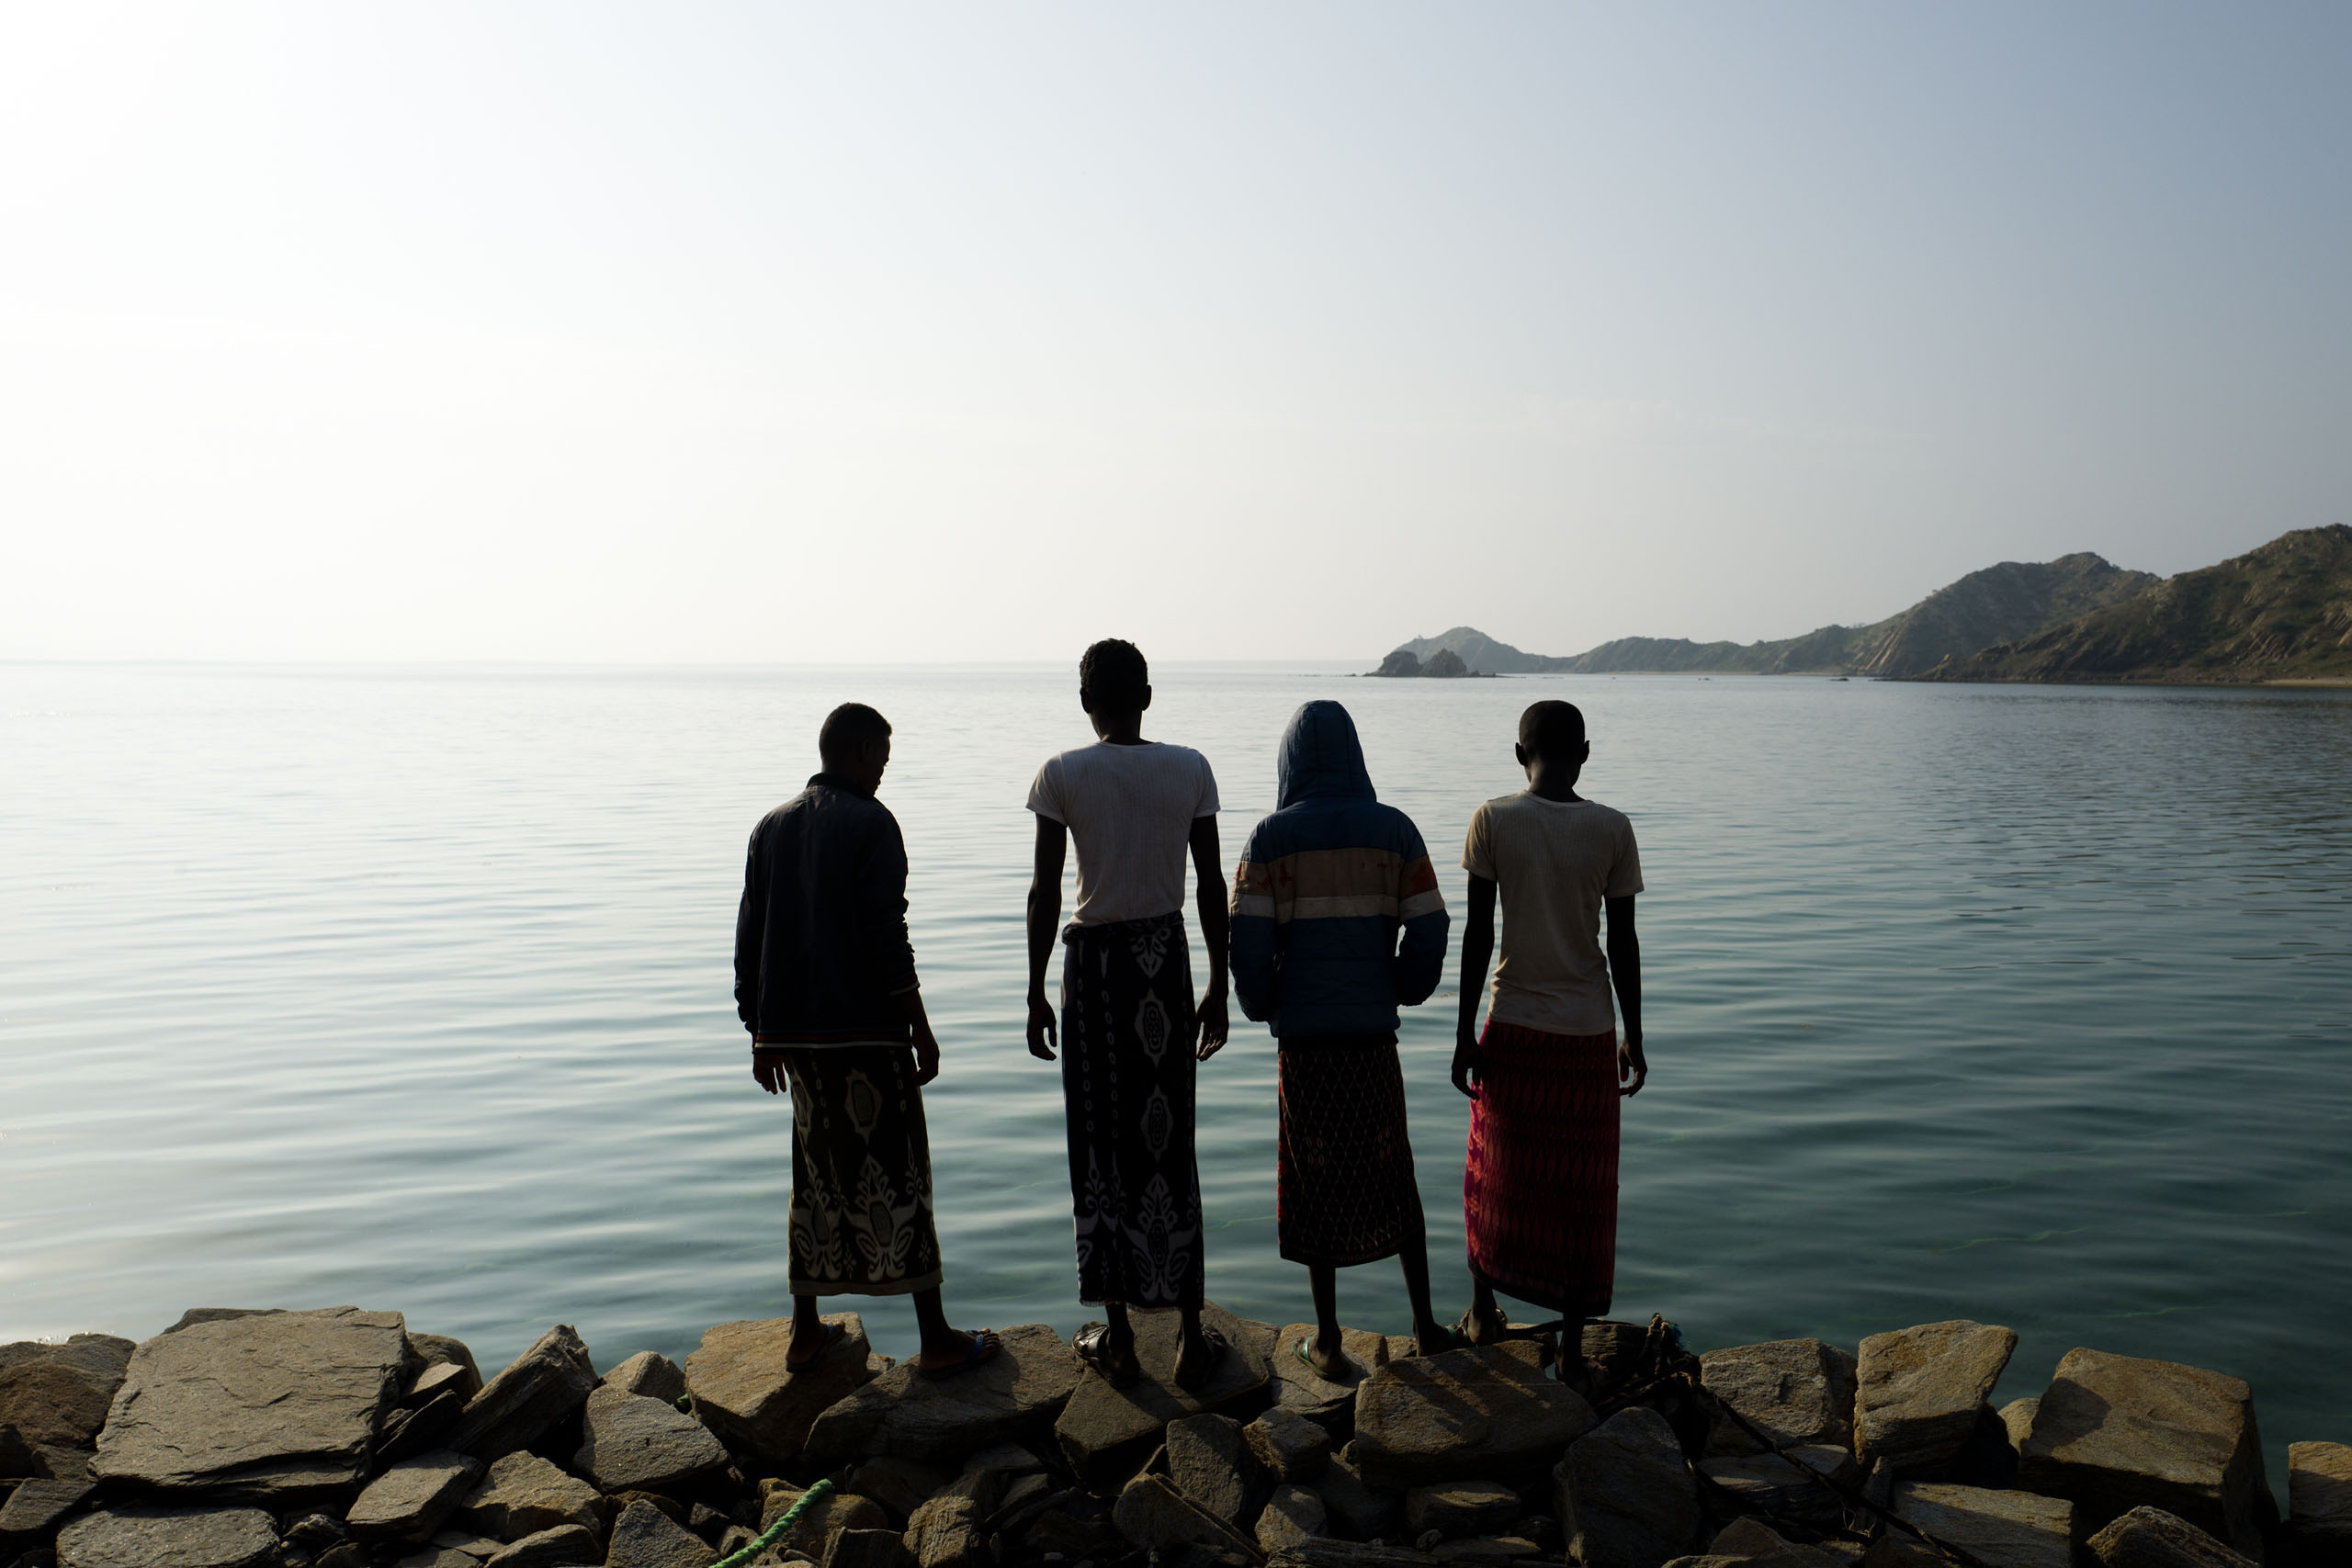 Fishermen looking  out to sea, Dissie Island, Dahlak Archipelago.